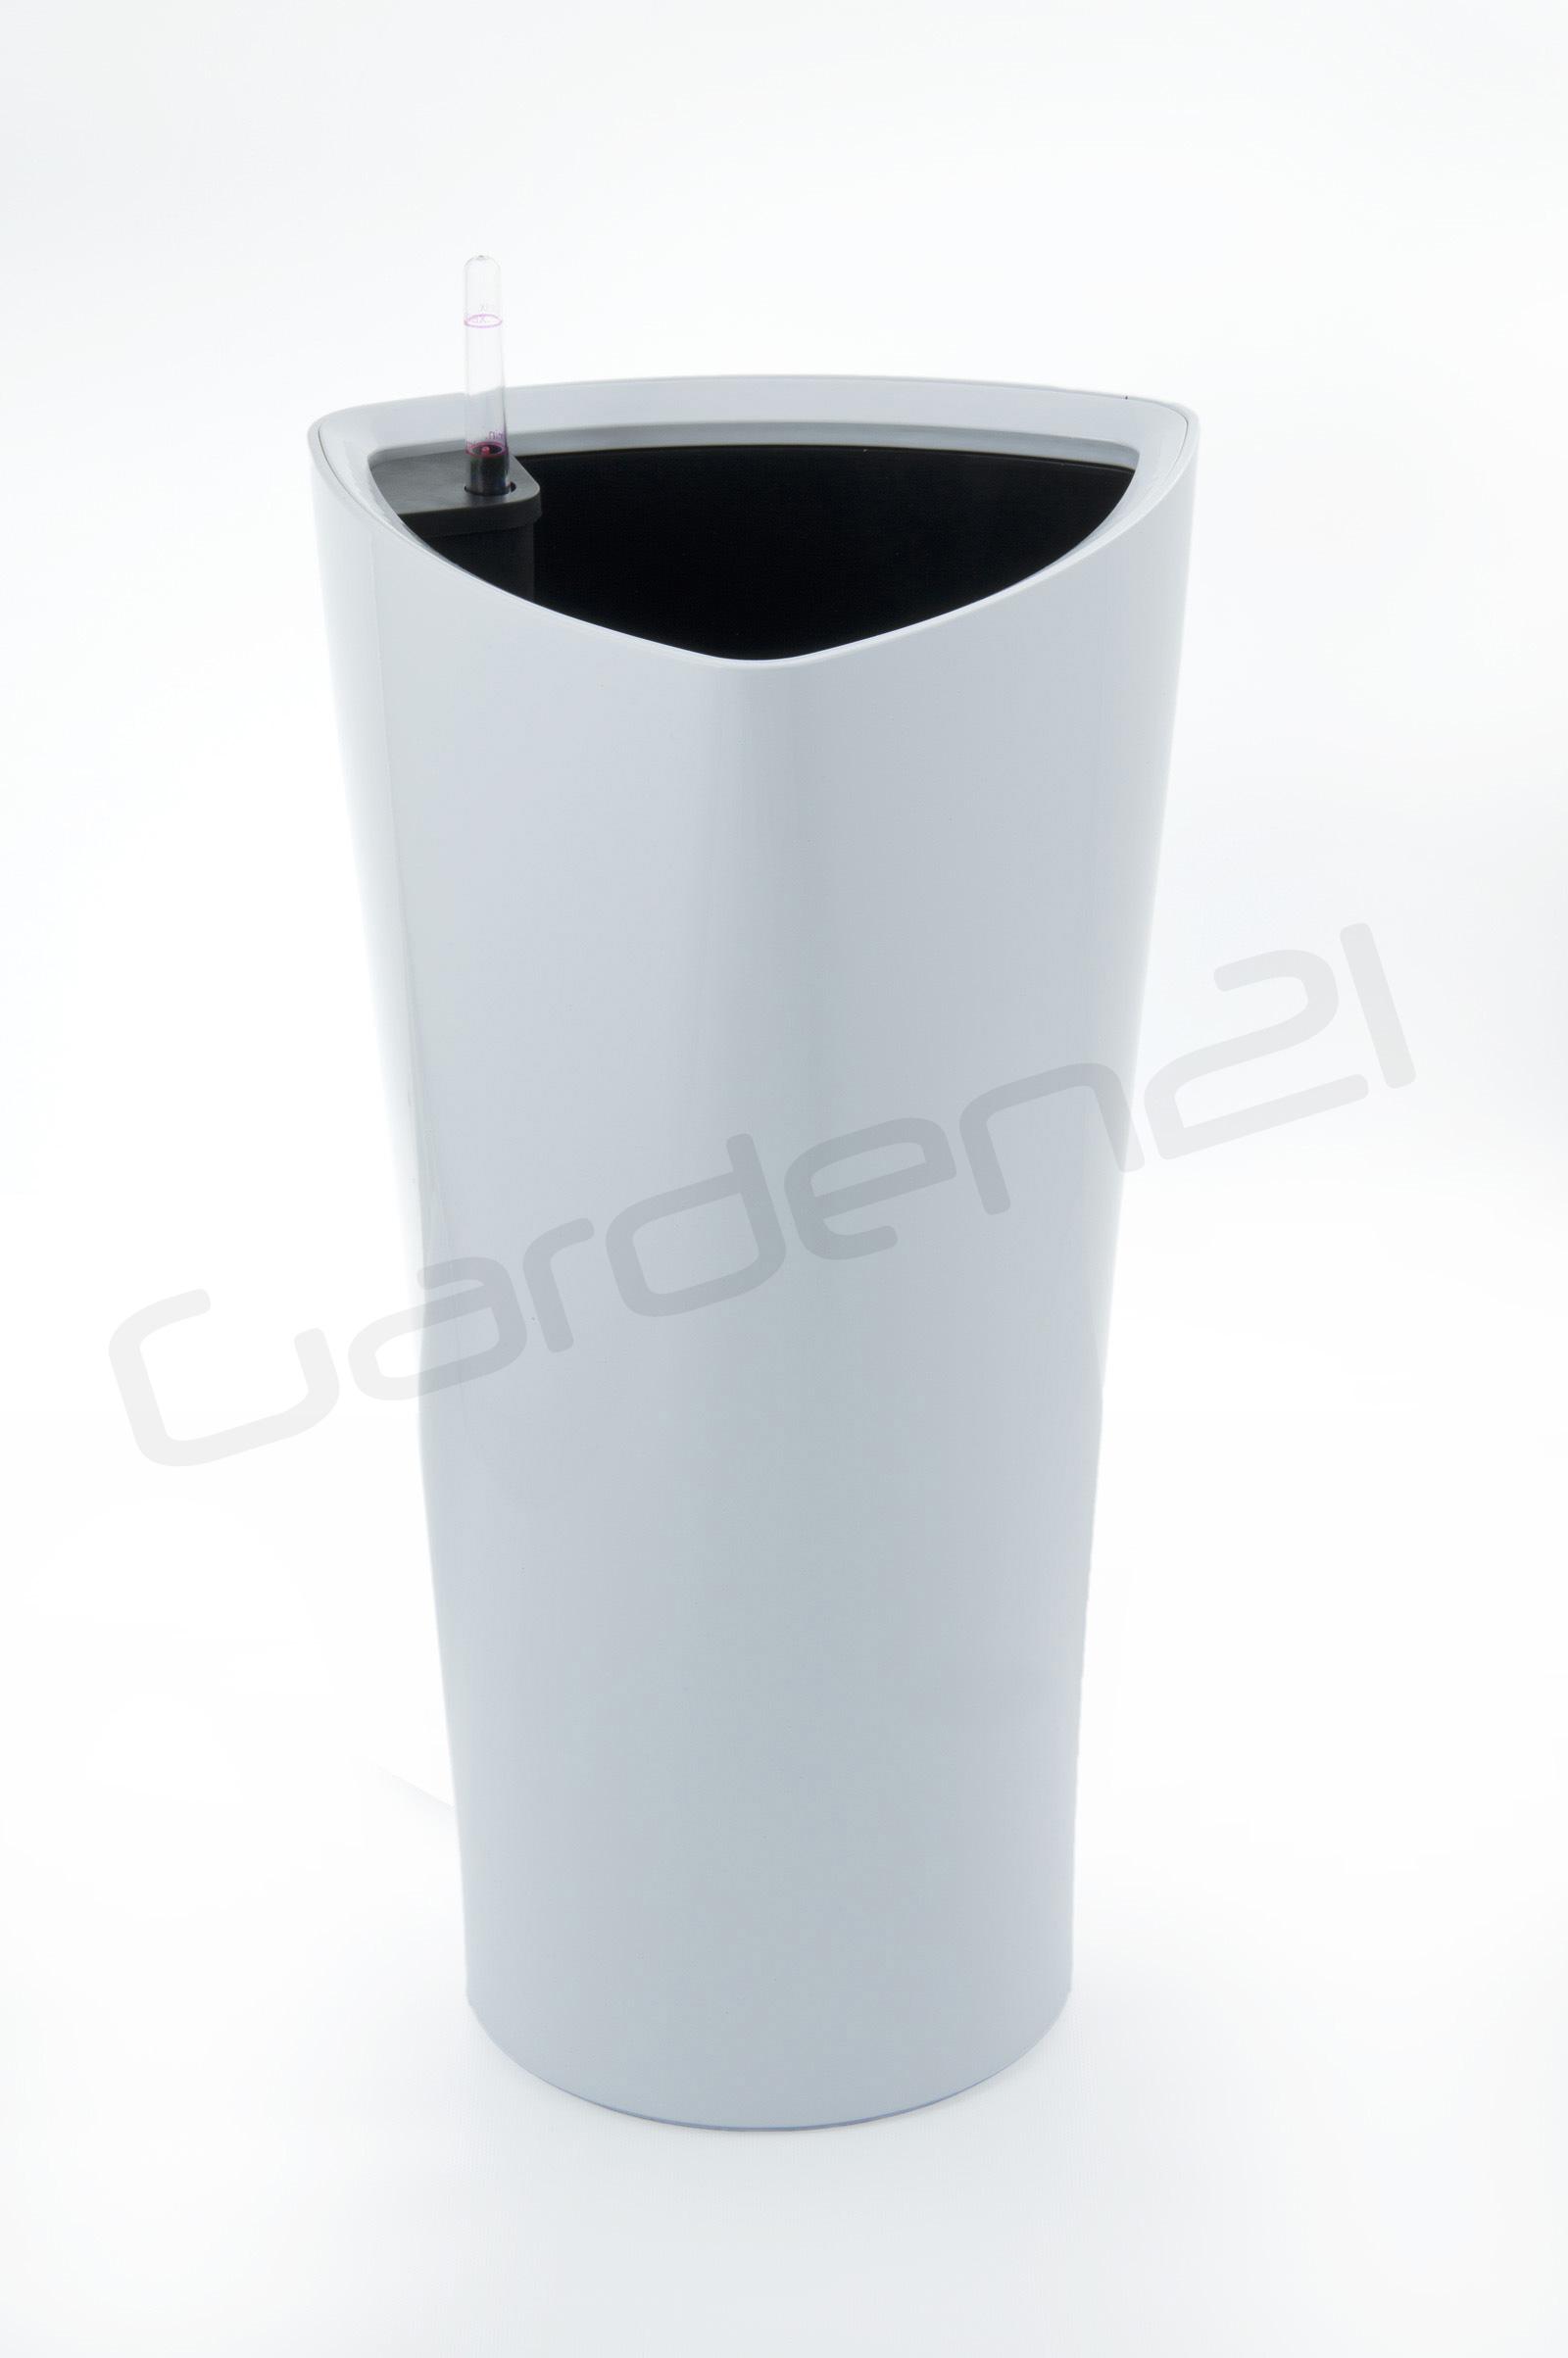 Samozavlažovací květináč G21 Trio bílý 56.5cm